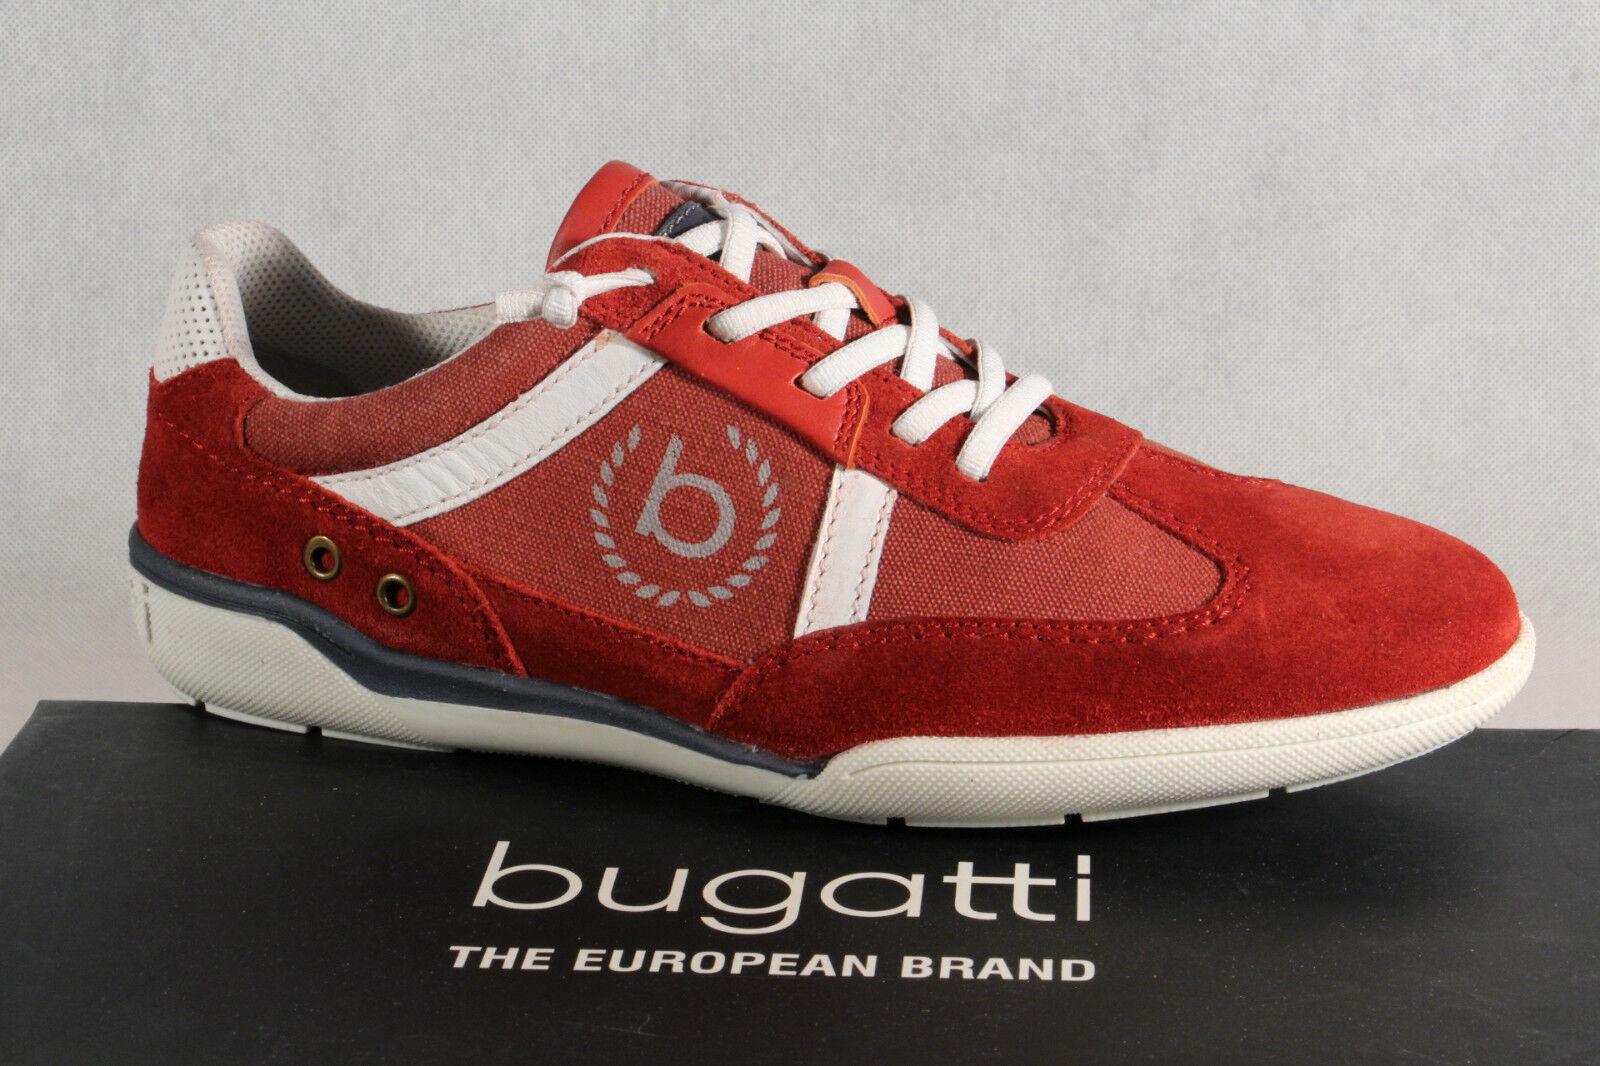 Bugatti Herren Schnürschuh Schnürschuhe Halbschuhe Sneaker rot NEU!